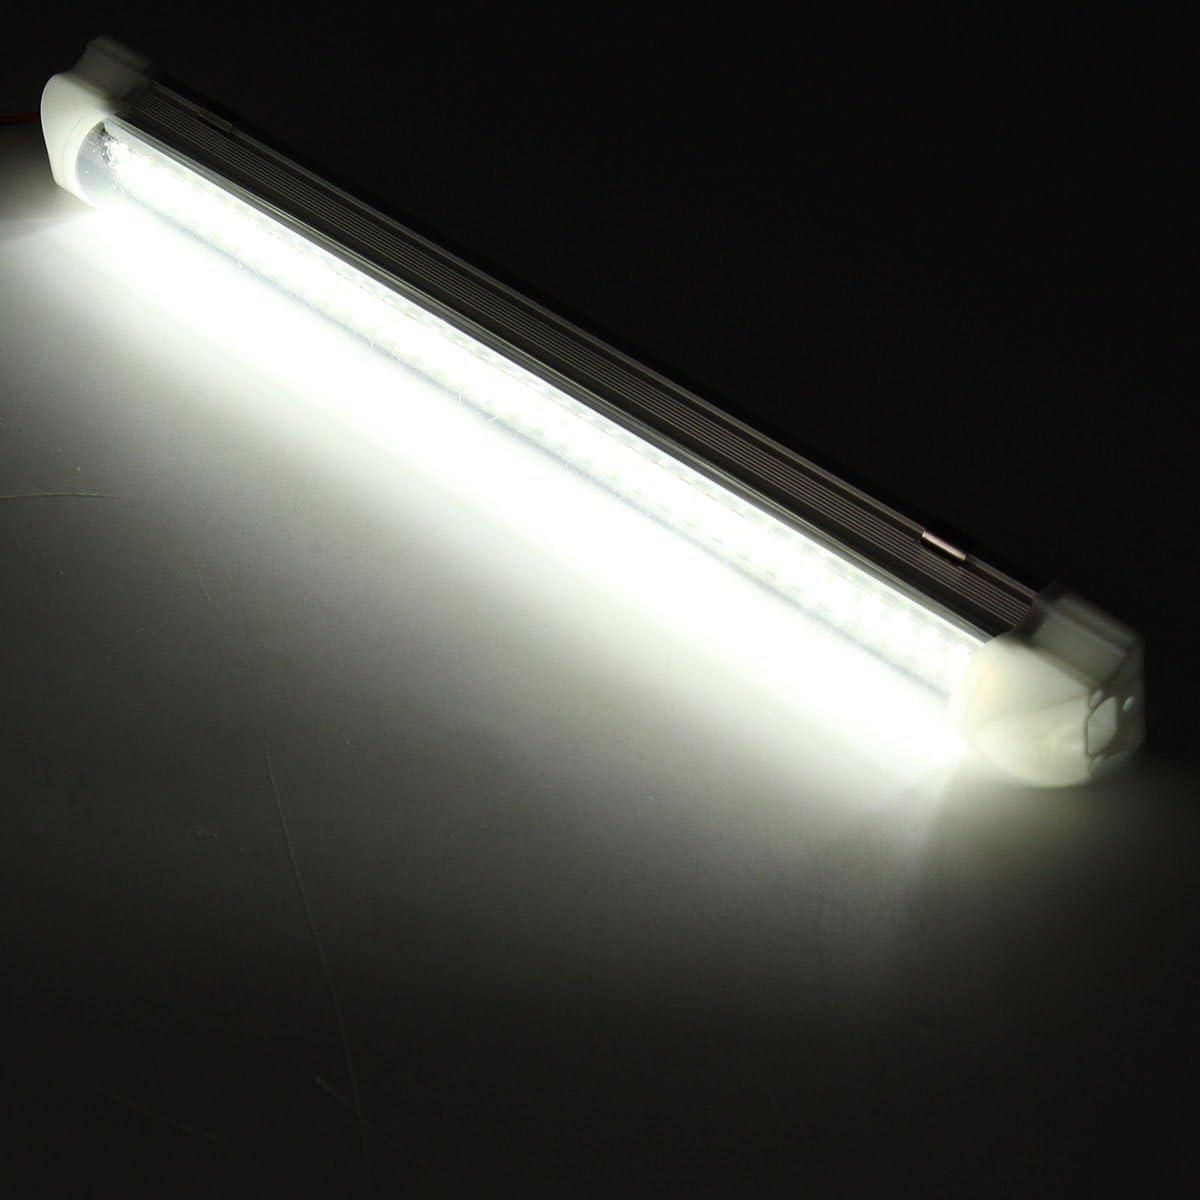 AUDEW LED 12V Interior LED Light Bar White Strip Light 340mm 12V 4.5W 72 LED Car Interior Light Strip for Van Bus Caravan with On / Off Switch (2 Pcs): Automotive